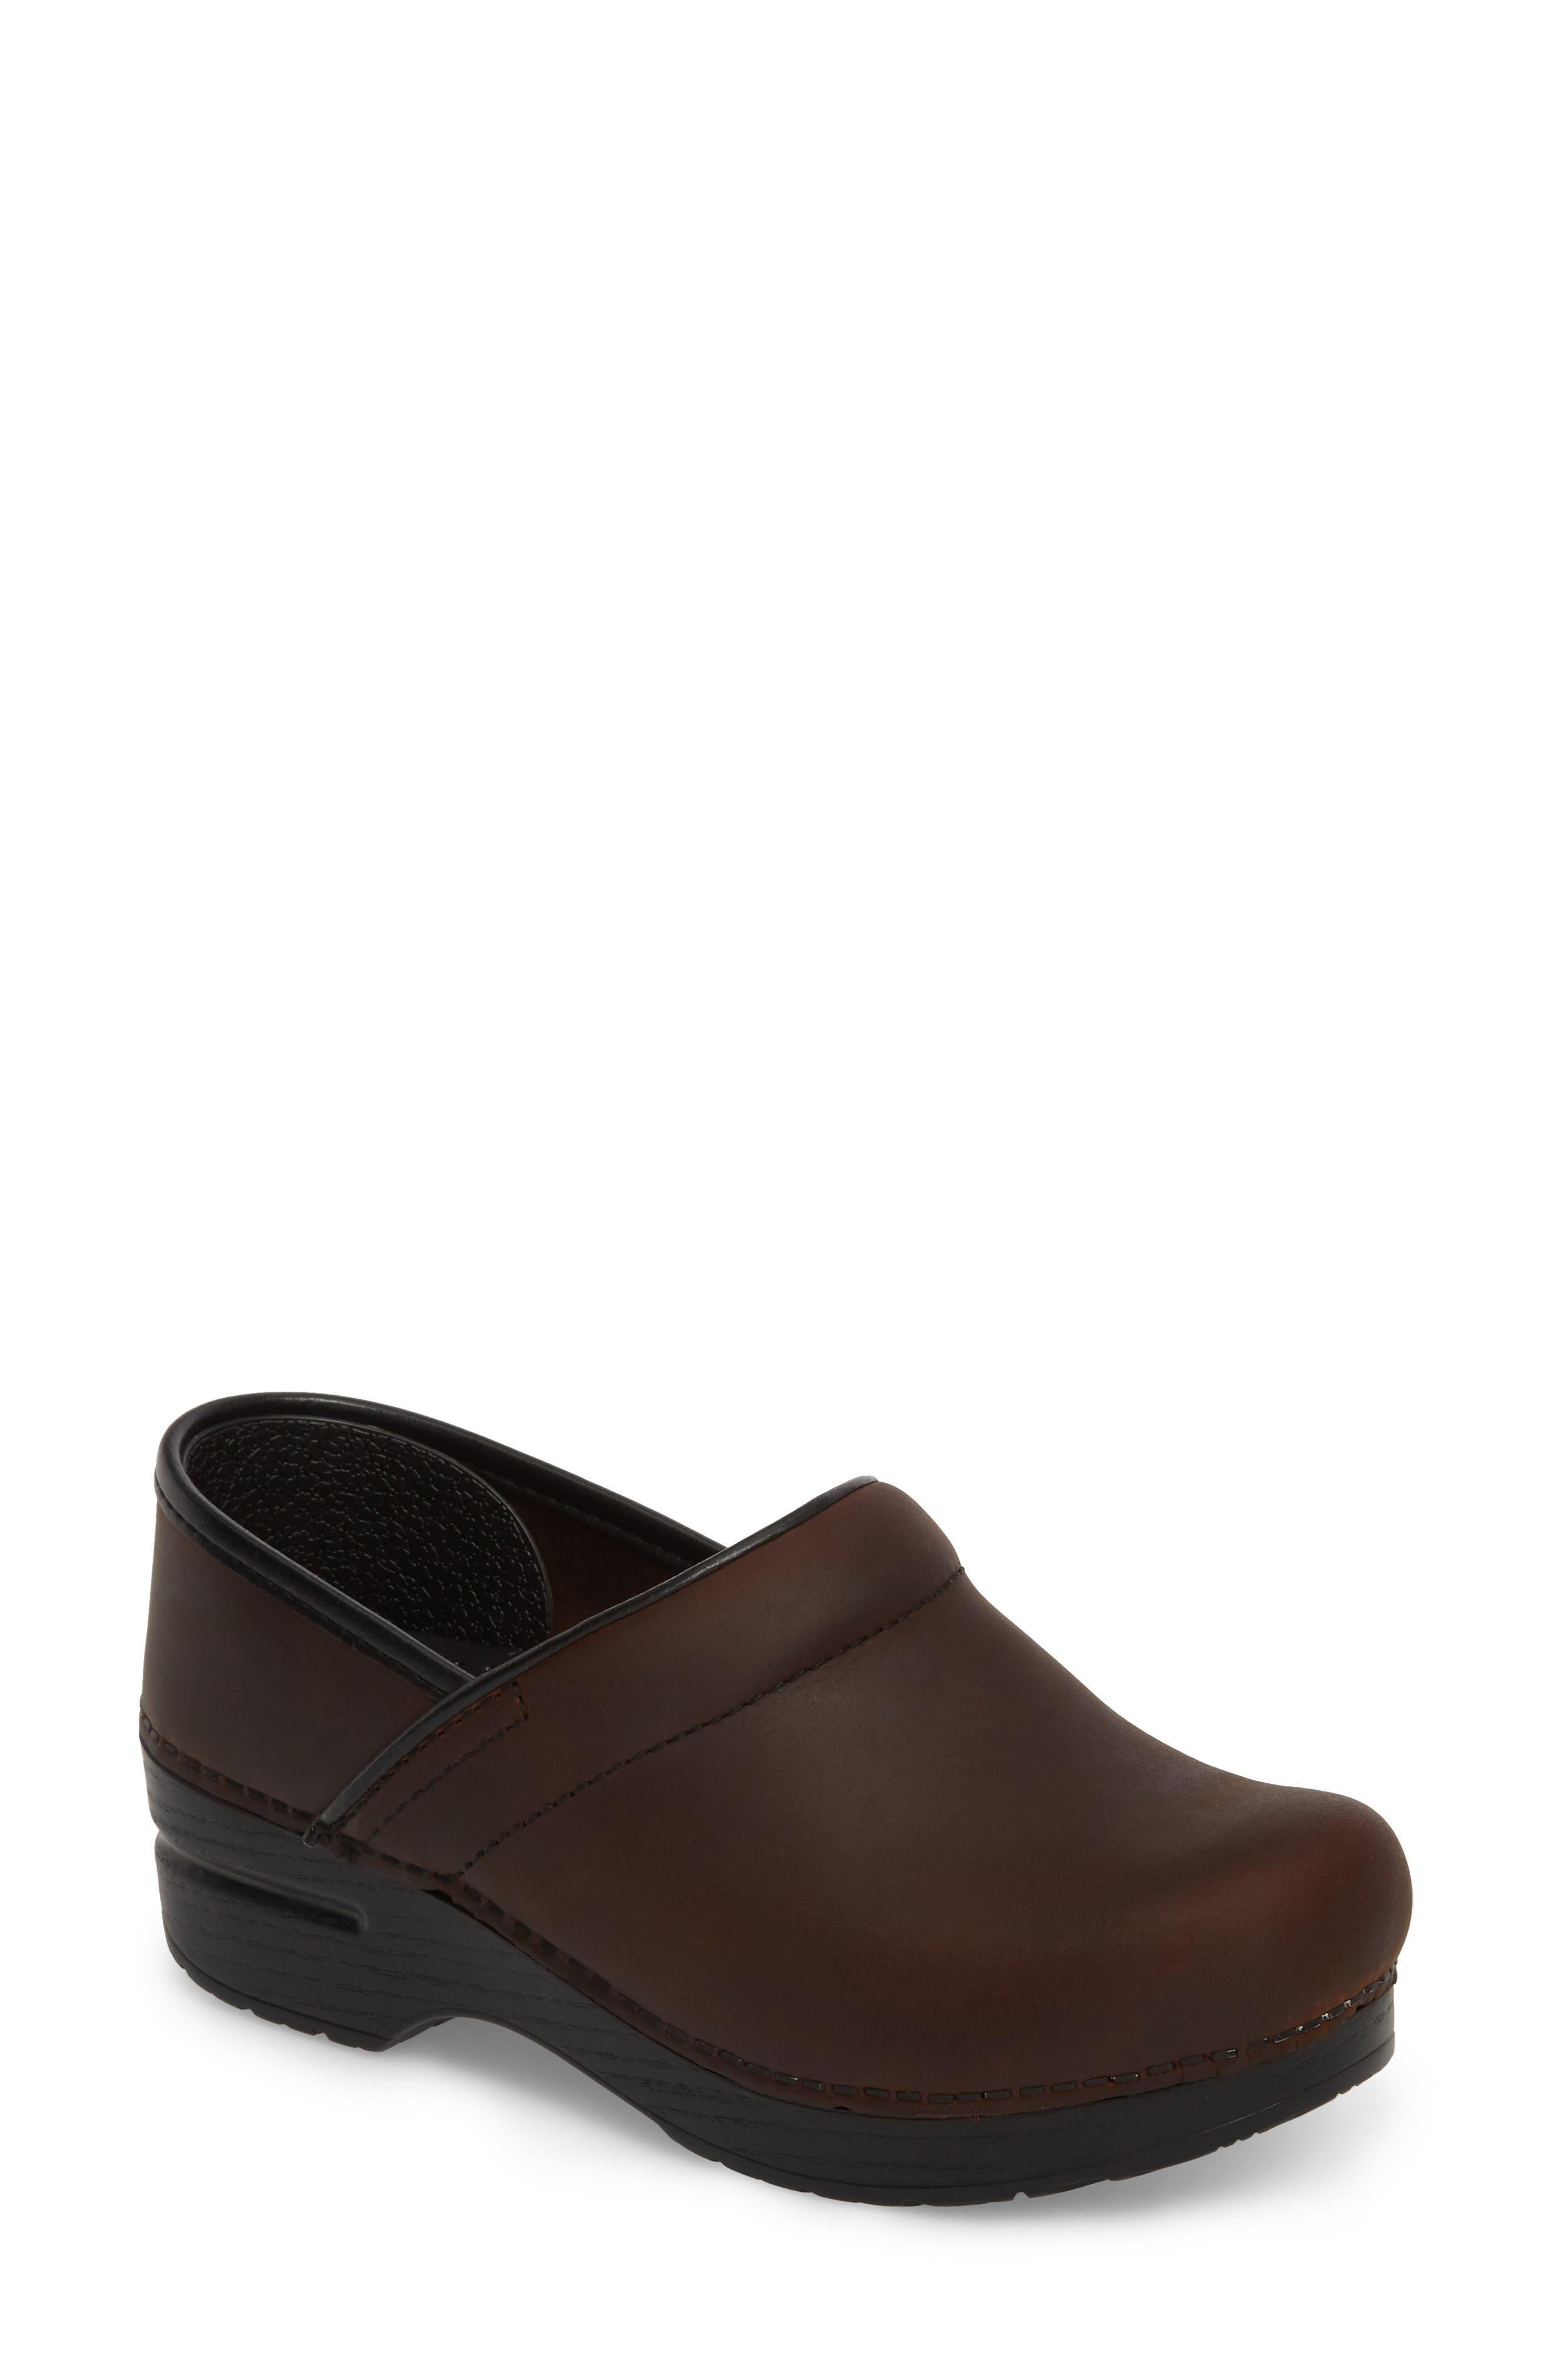 Wide Pro Clog,                         Main,                         color, Antique Brown/ Black Leather